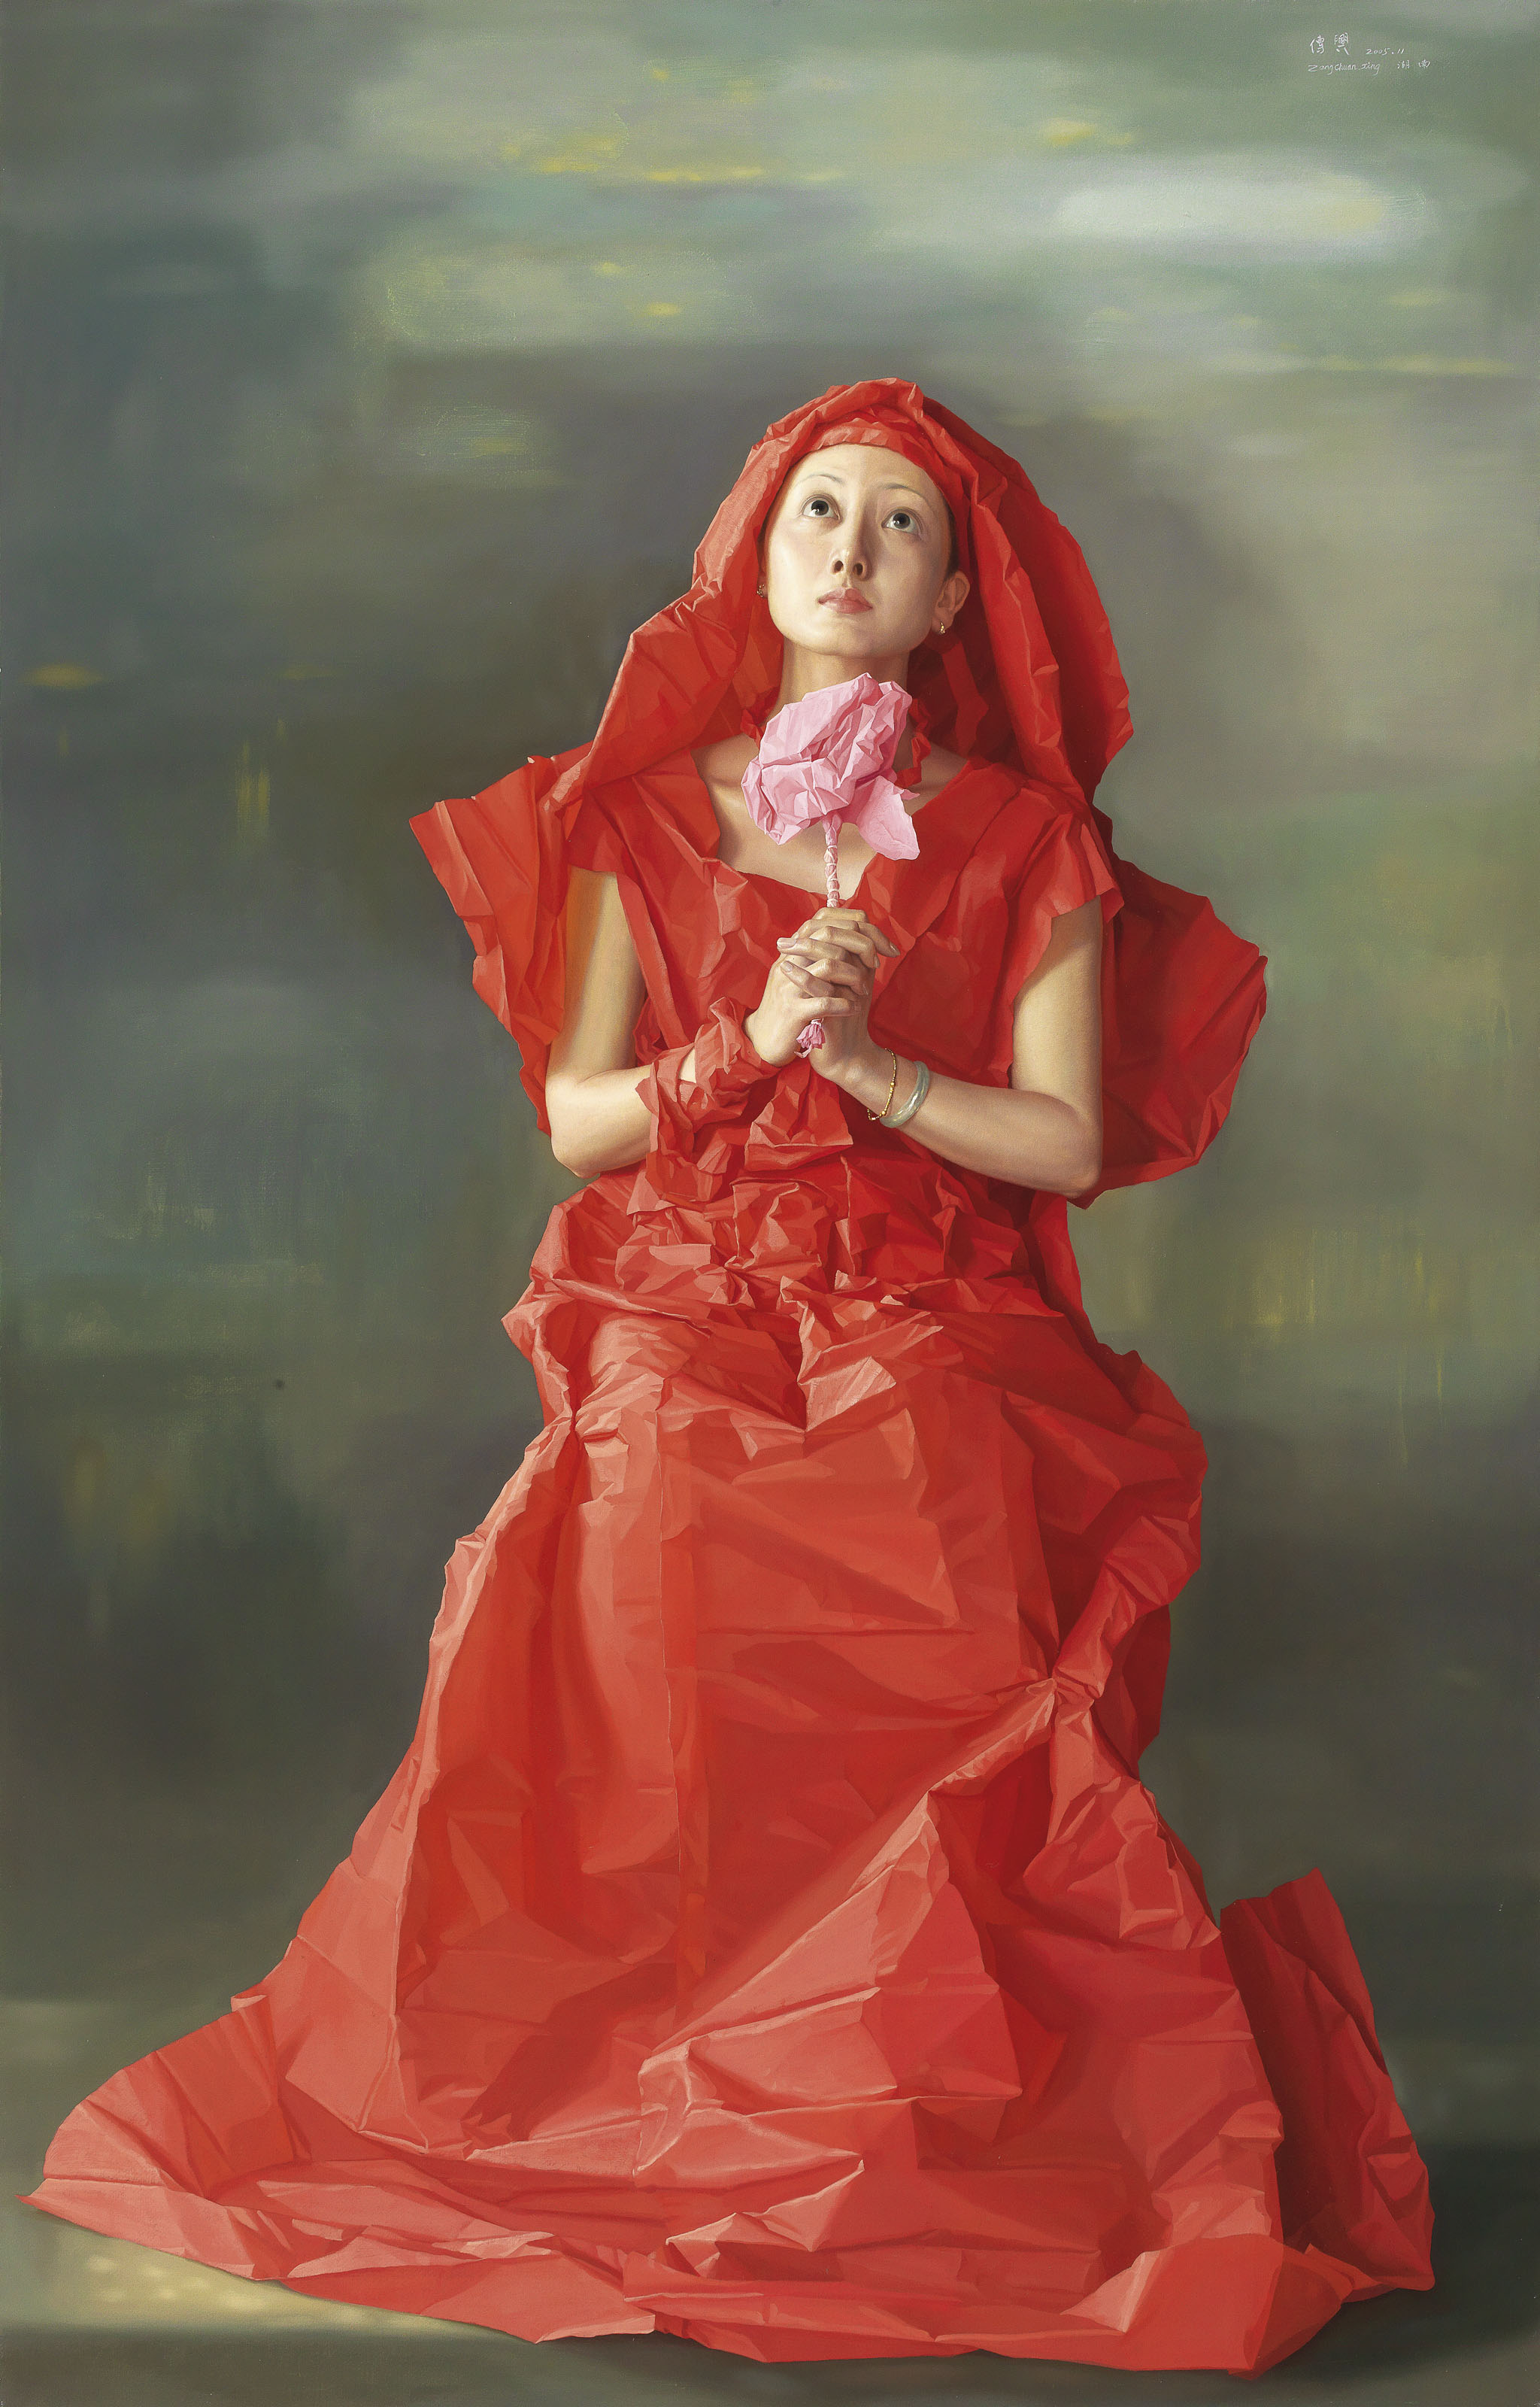 Paper Bride: The Prayer